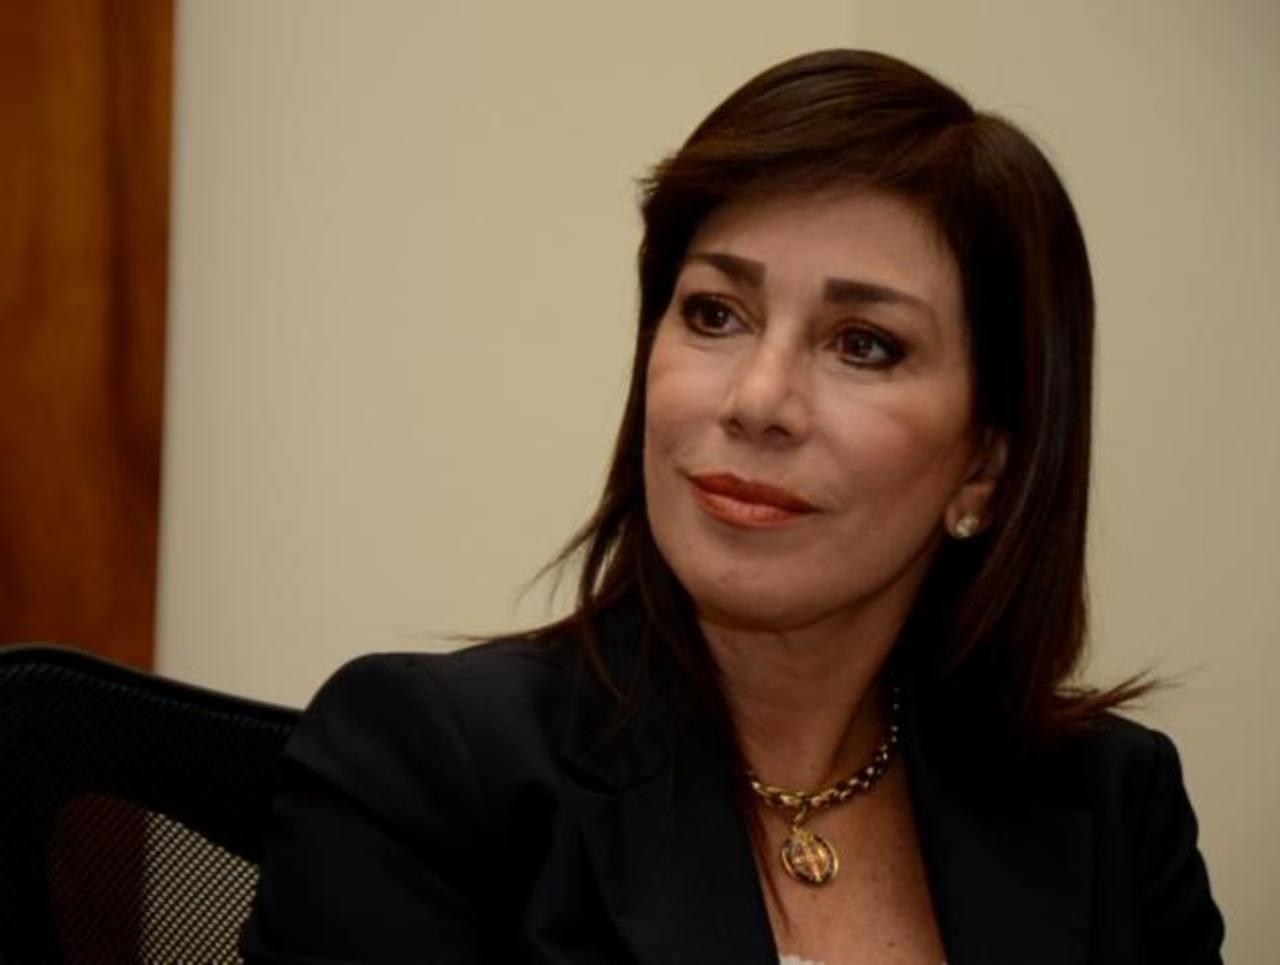 Ana Vilma de Escobar descarta candidatura para alcaldía de San Salvador